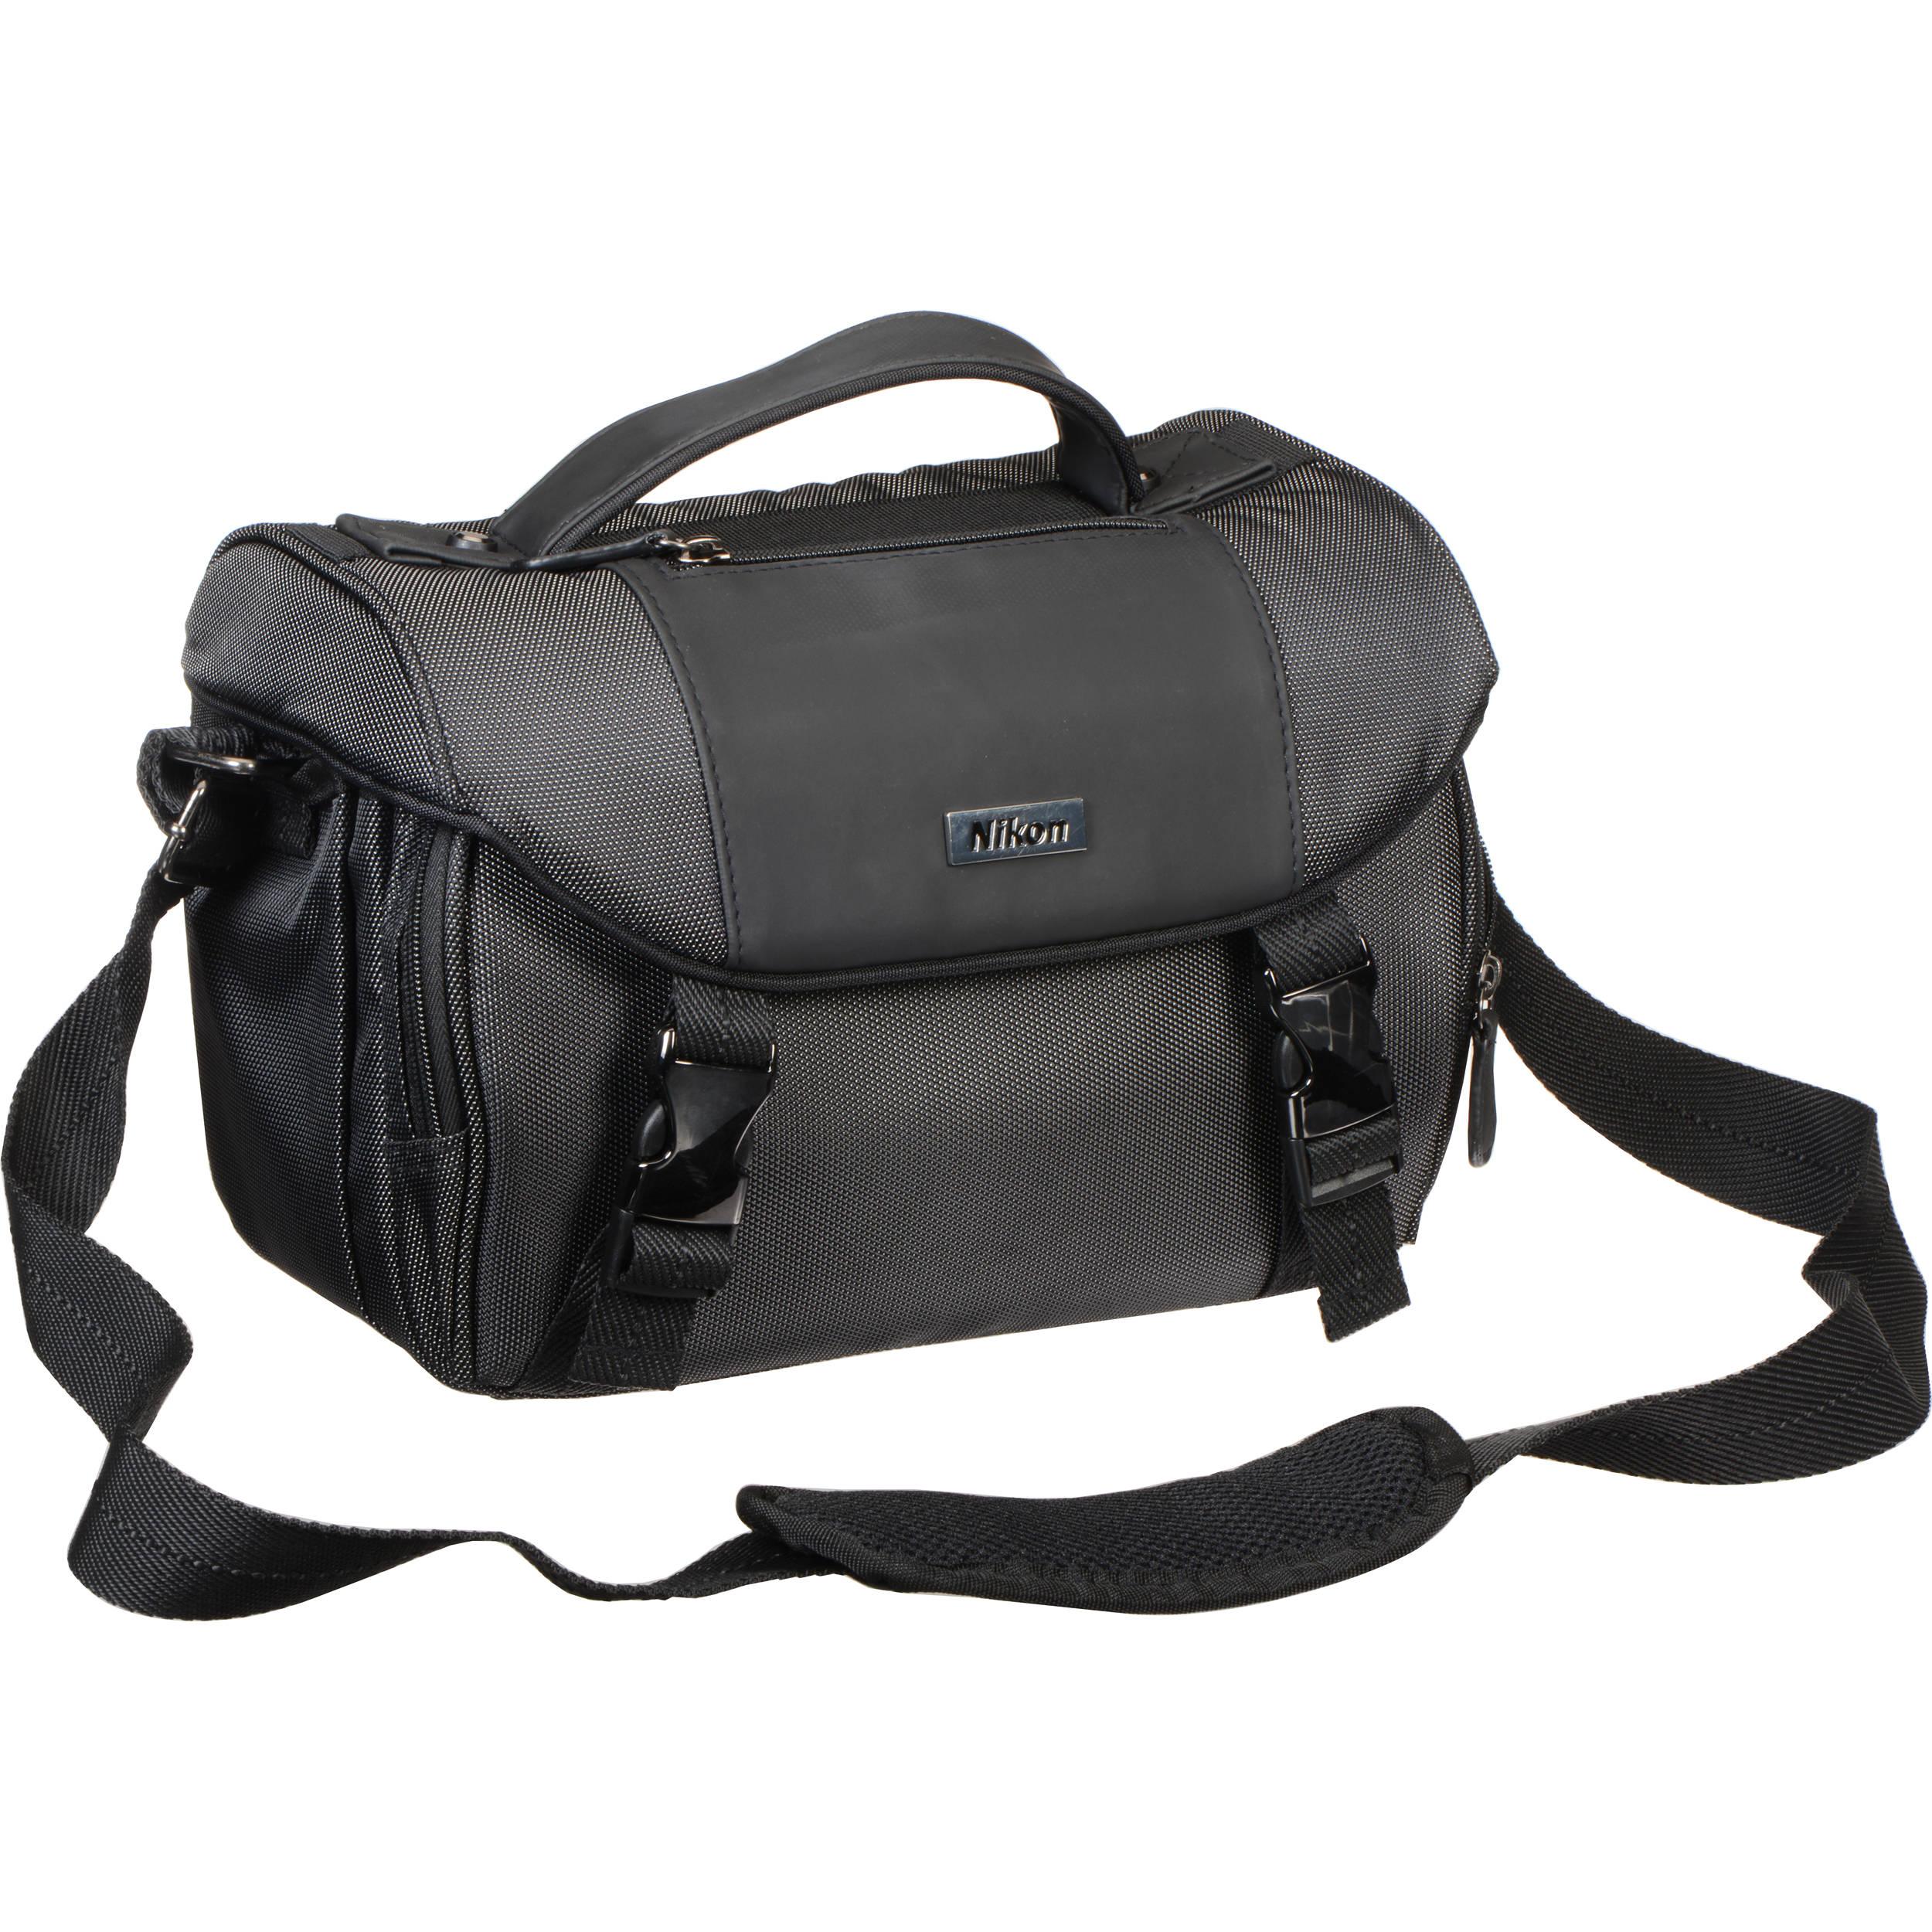 2068cdde918b Nikon Deluxe Digital SLR Camera Case (Black)